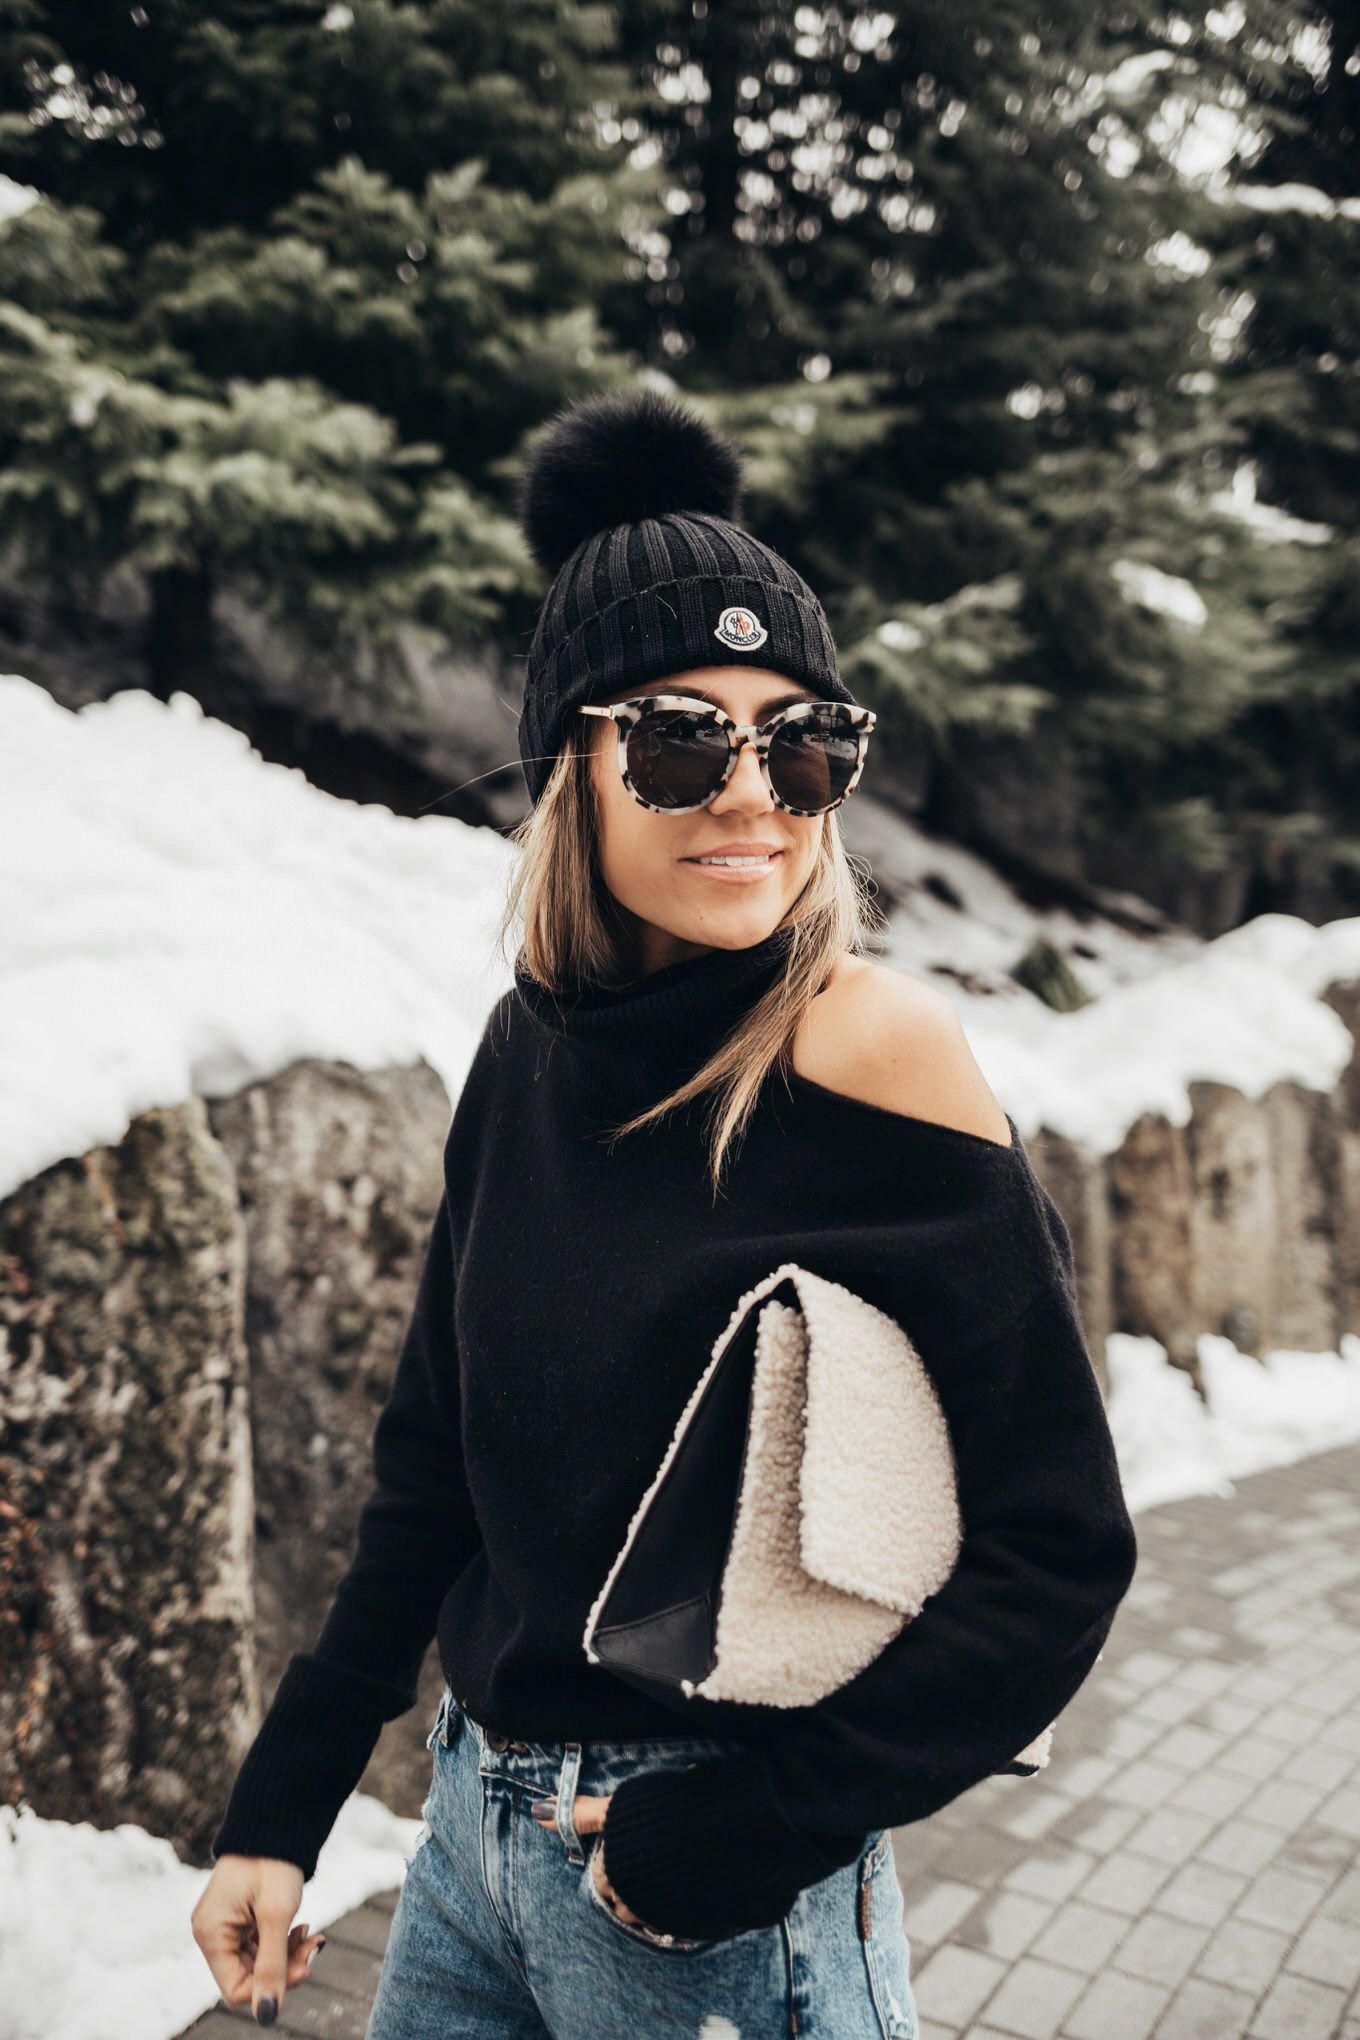 Women and Fashion Whistler